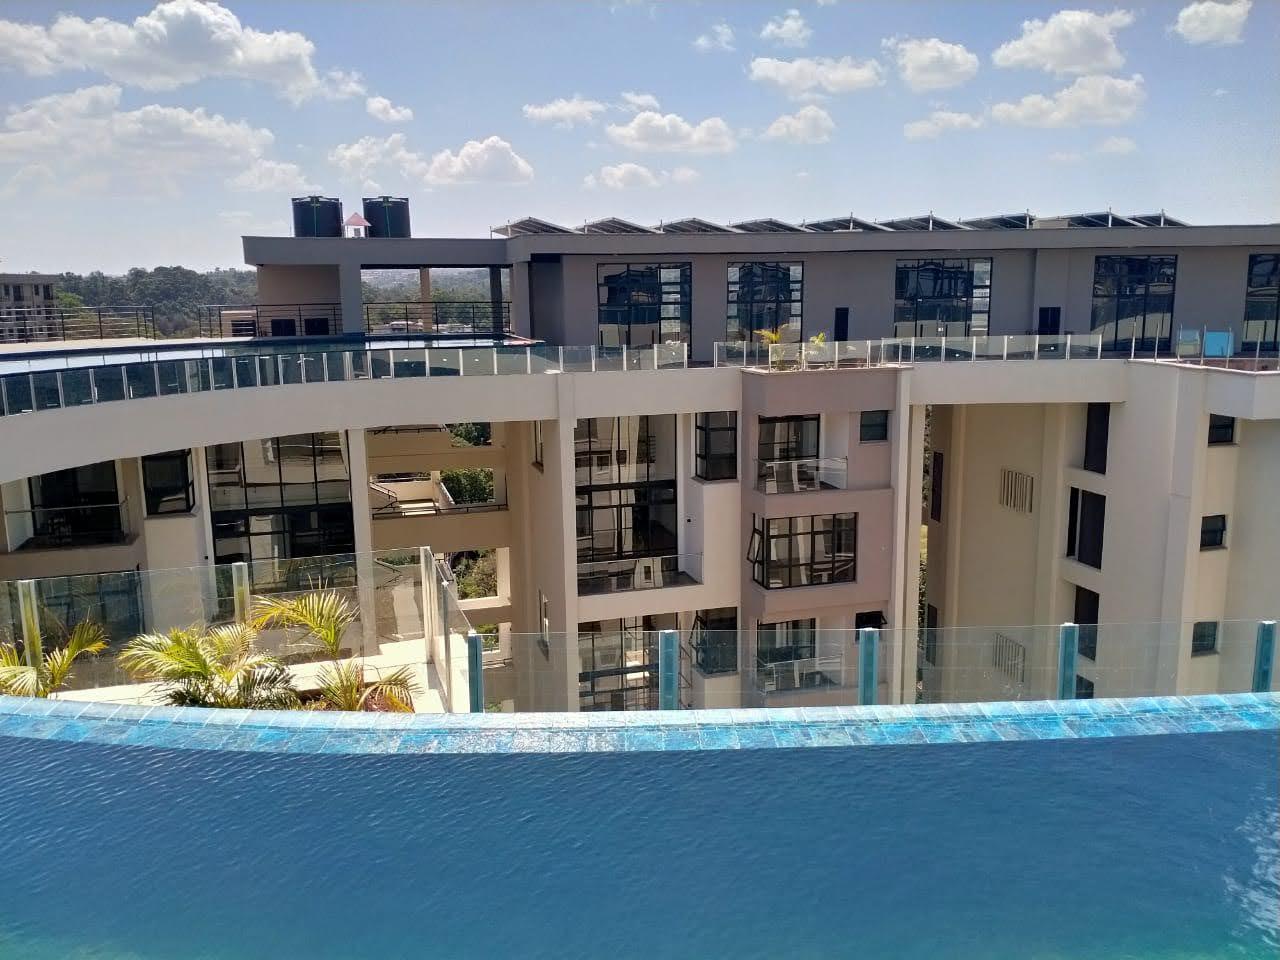 3 Bedroom Duplex Apartments for Sale